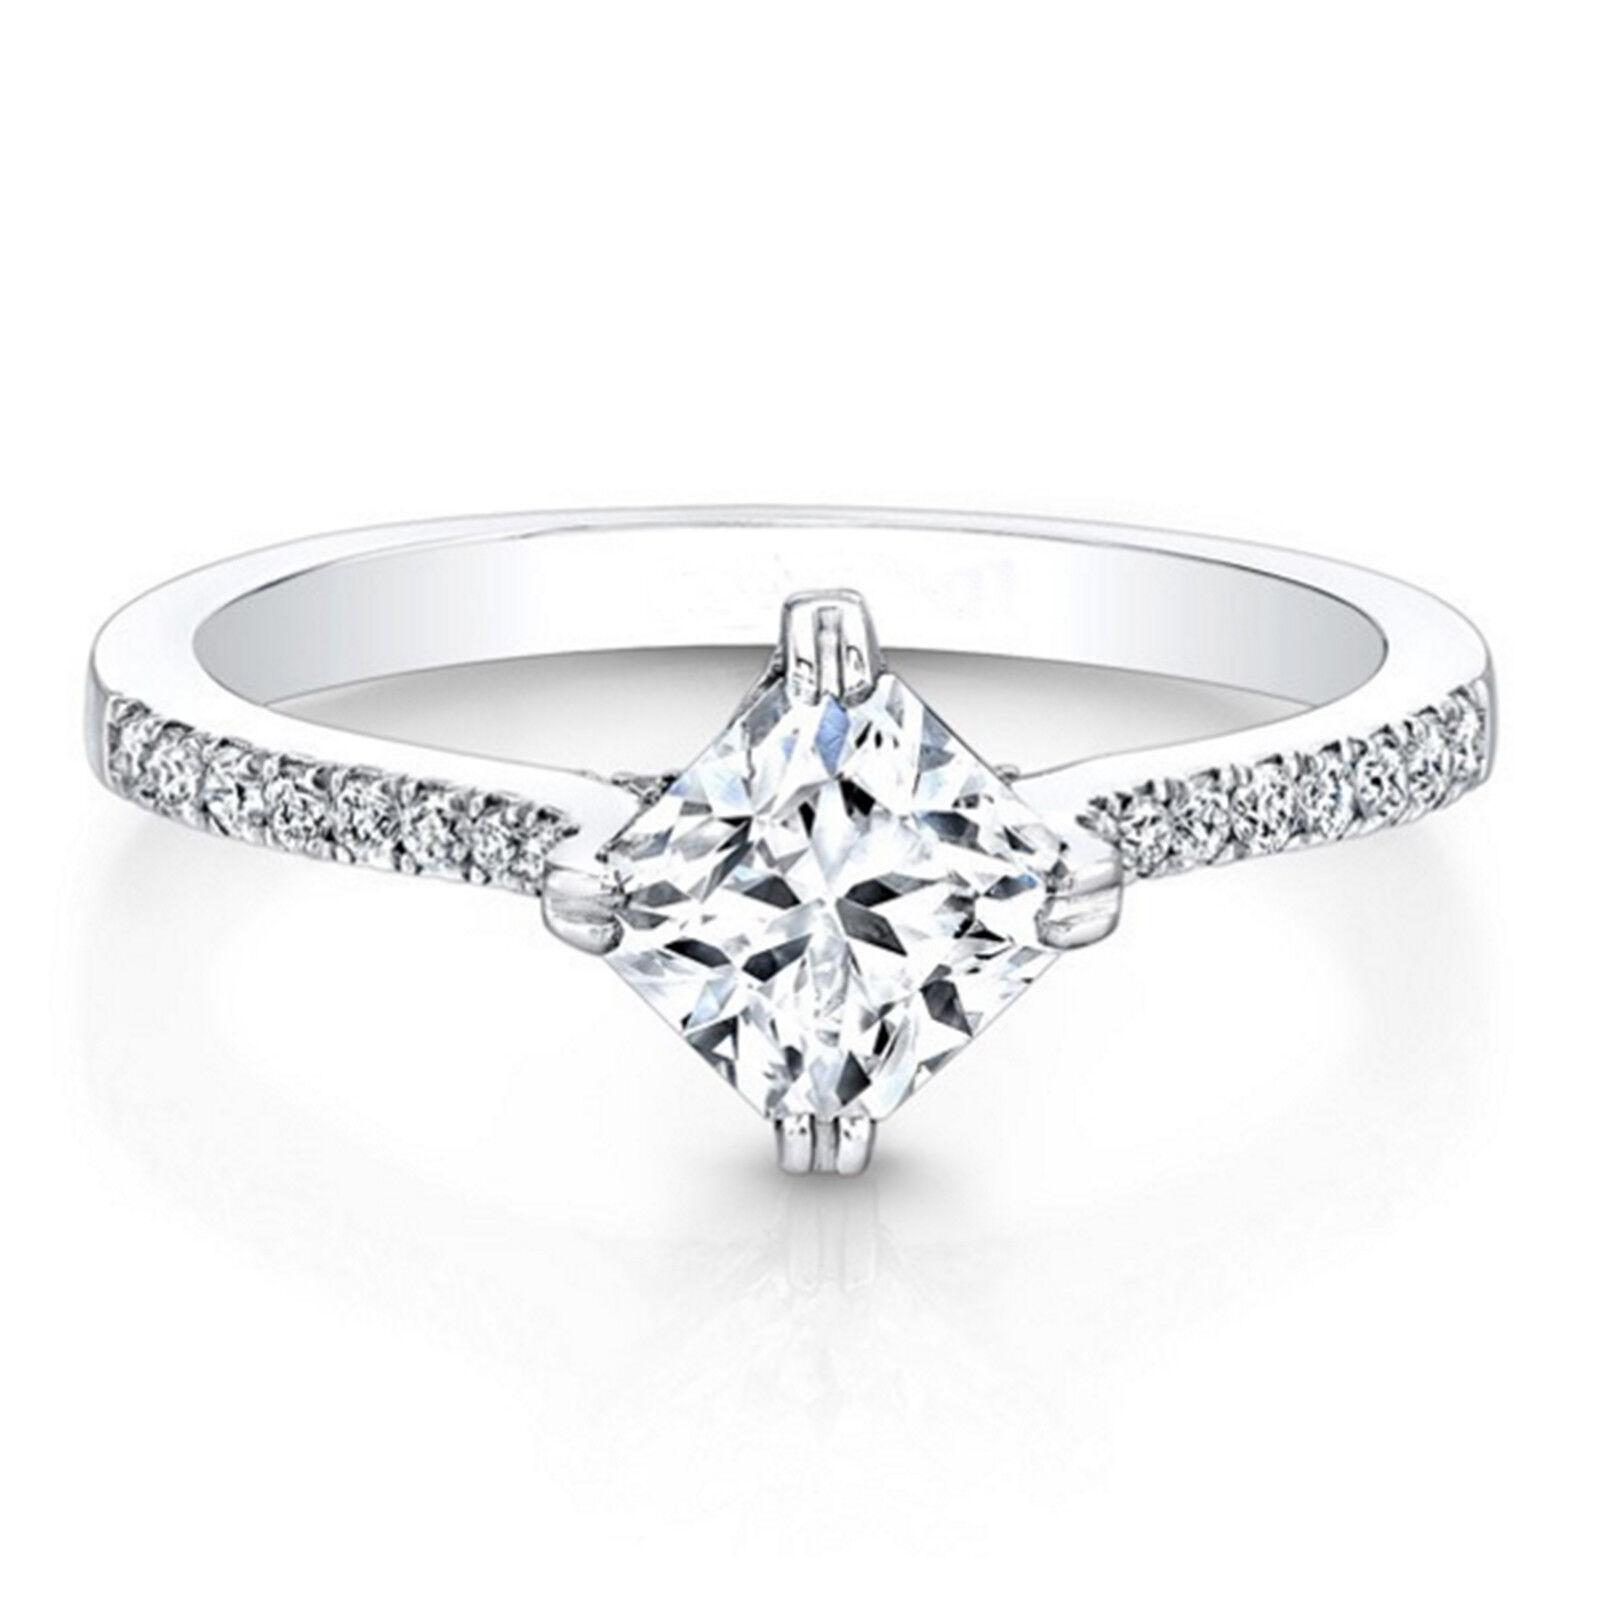 0.66 Ct Real Genuine Diamond Engagement Wedding Ring 14K White gold Rings Size 8